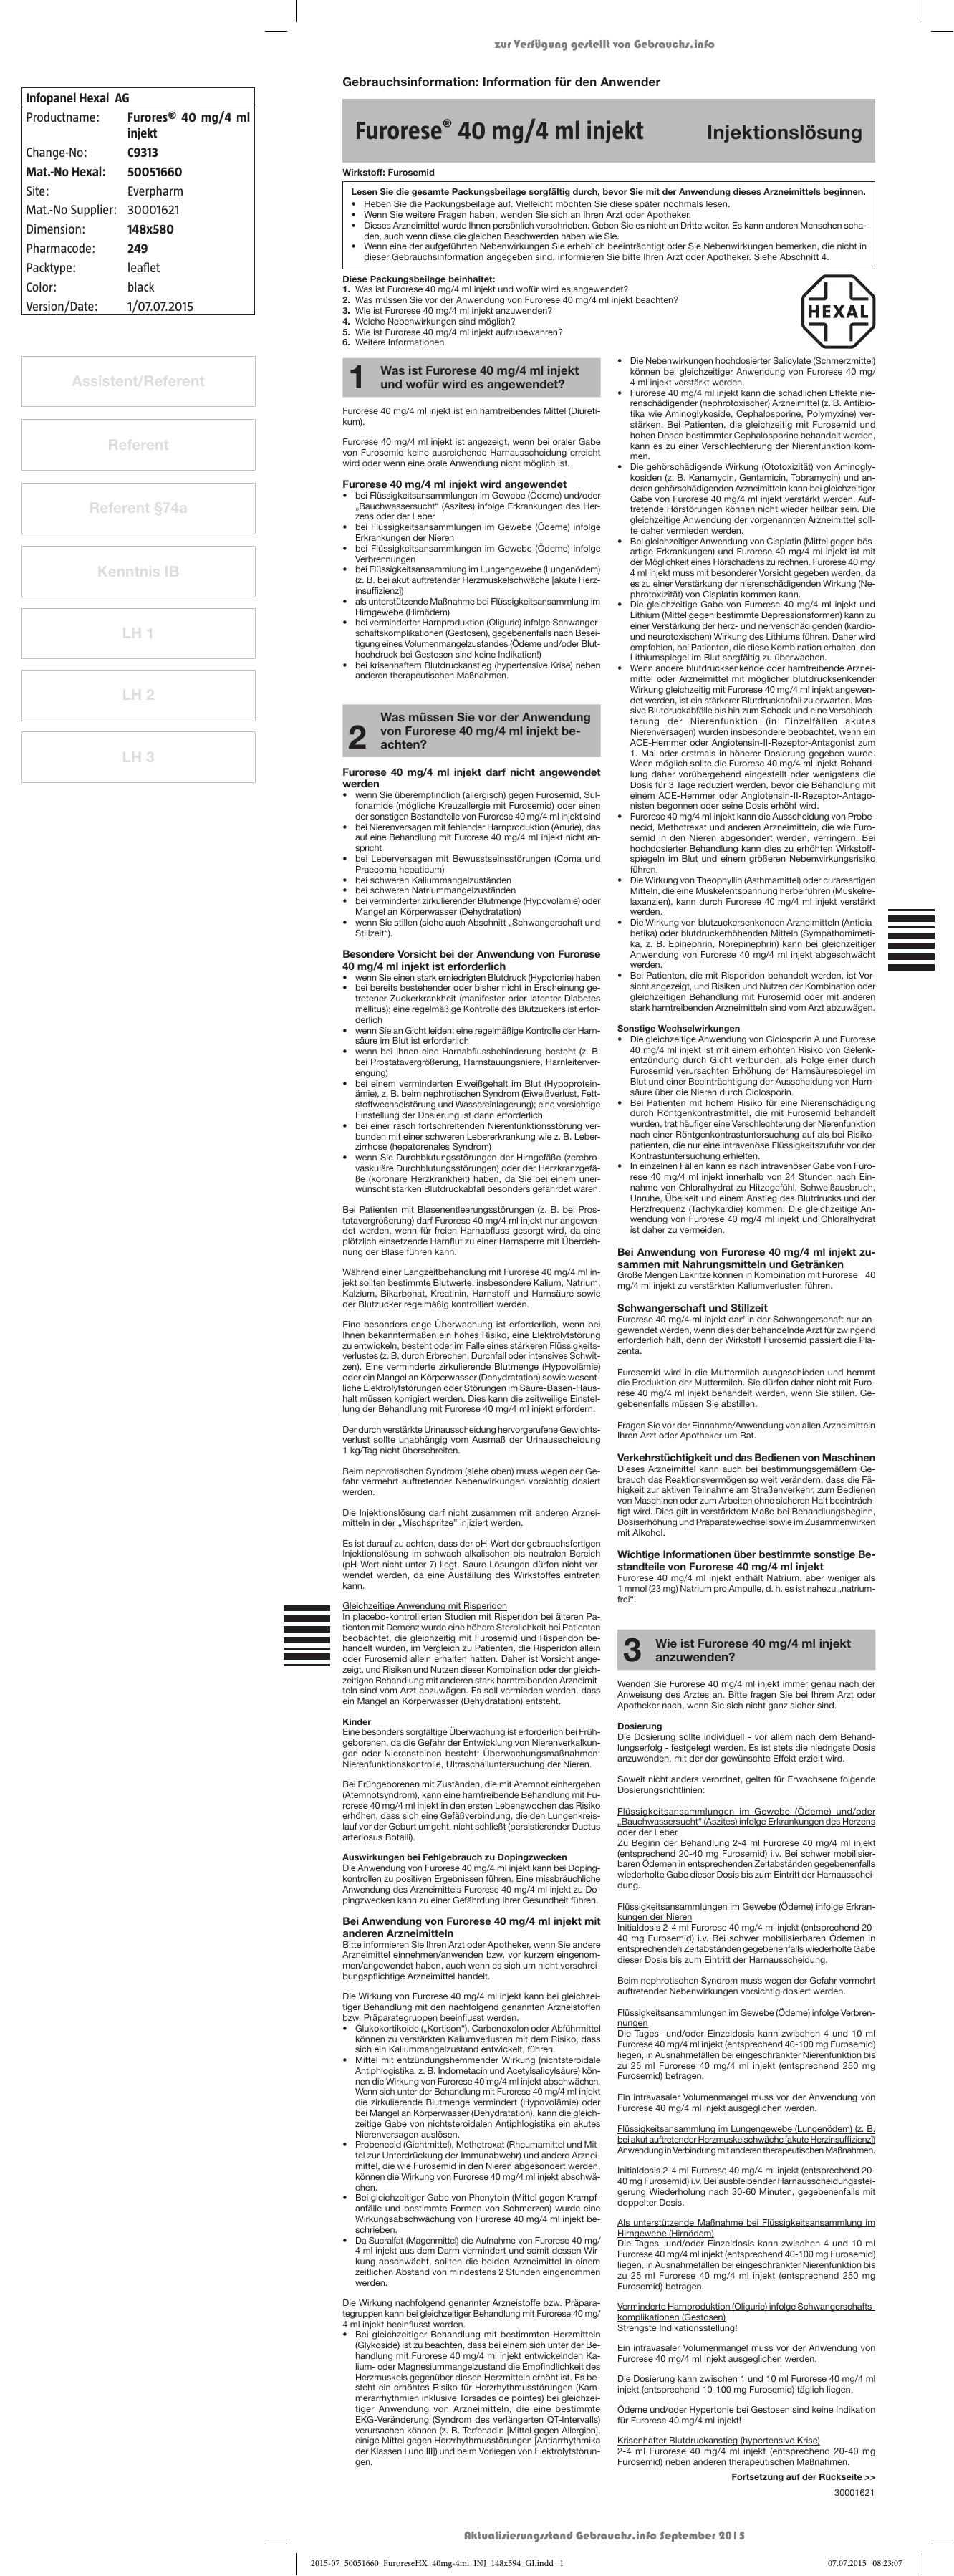 Furorese® 40 mg/4 ml injekt - Shop